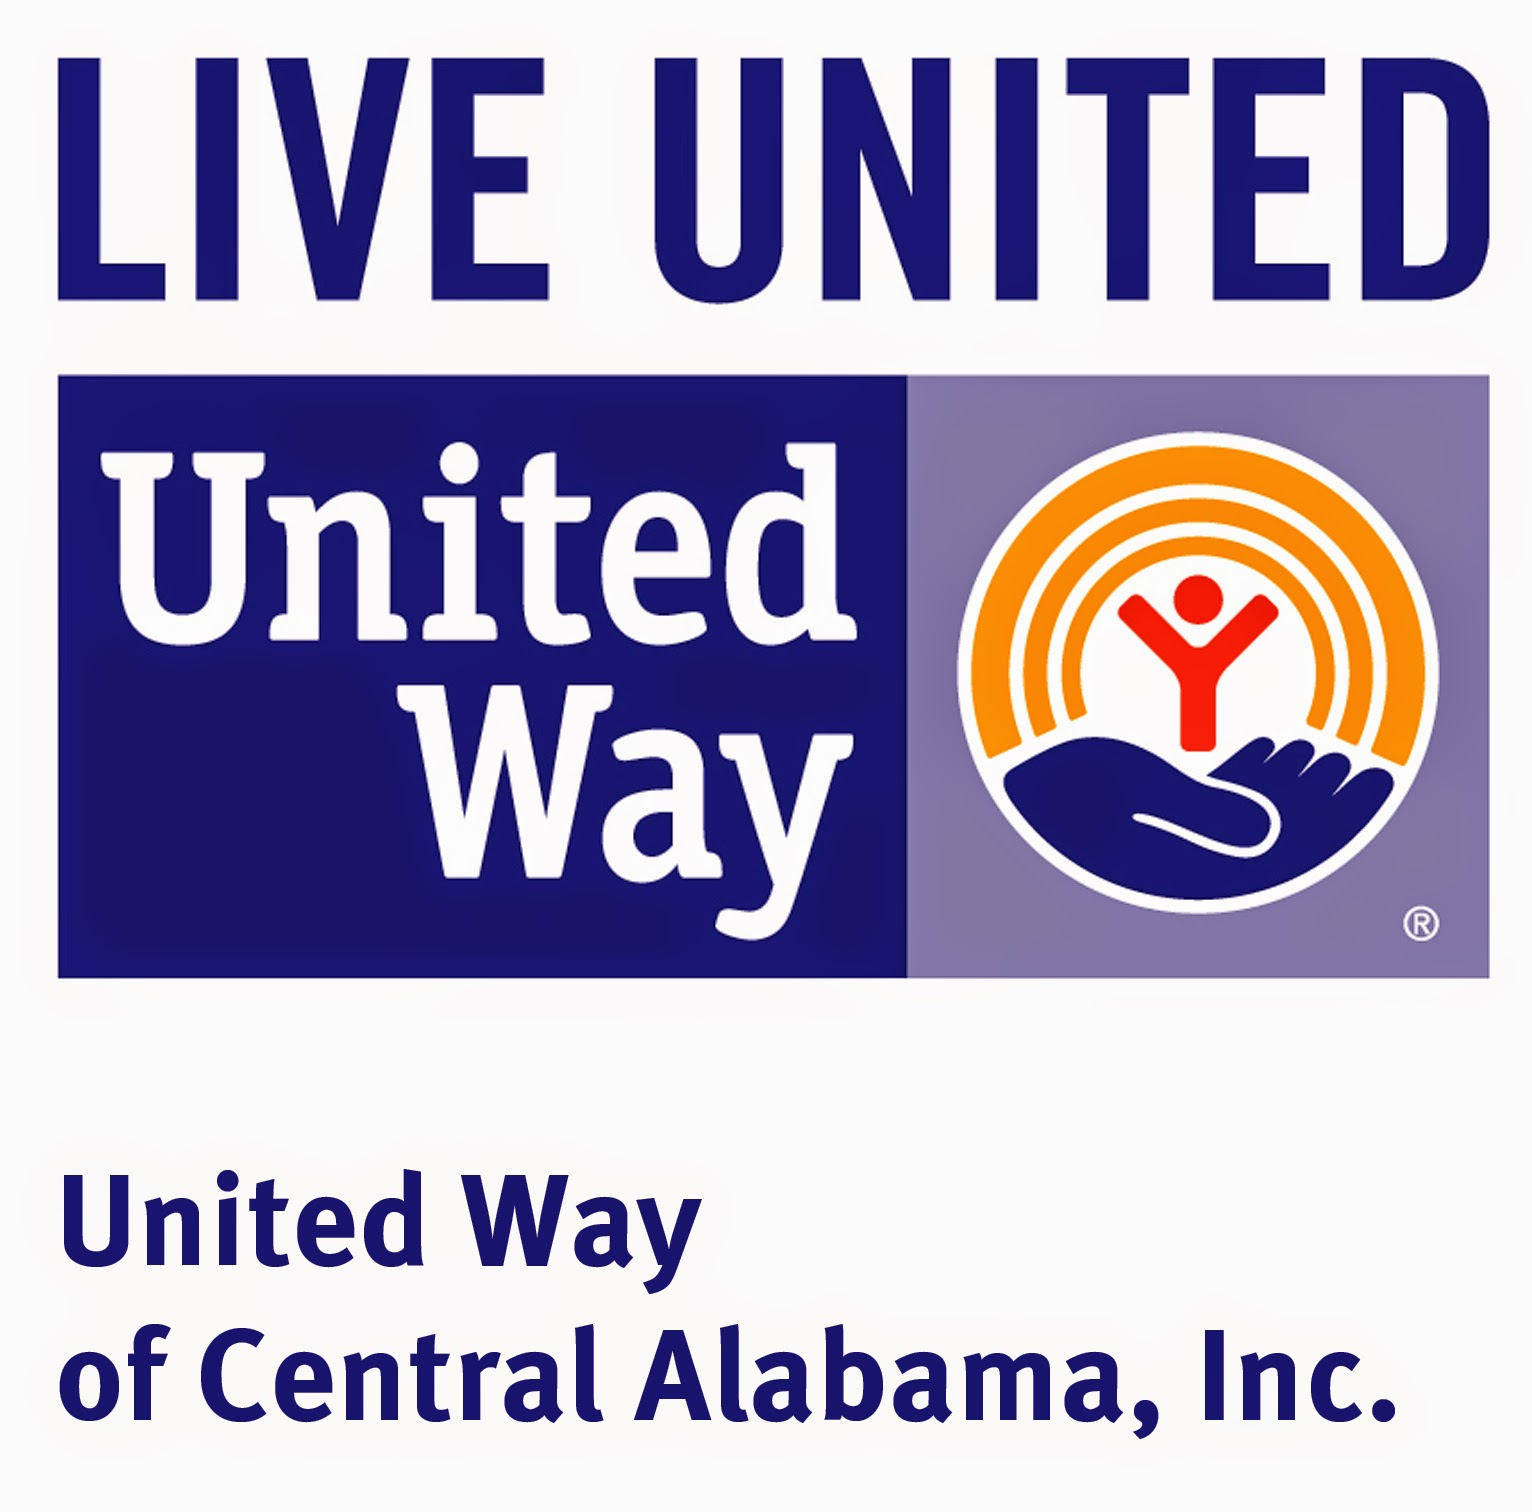 United Way of Central Alabama